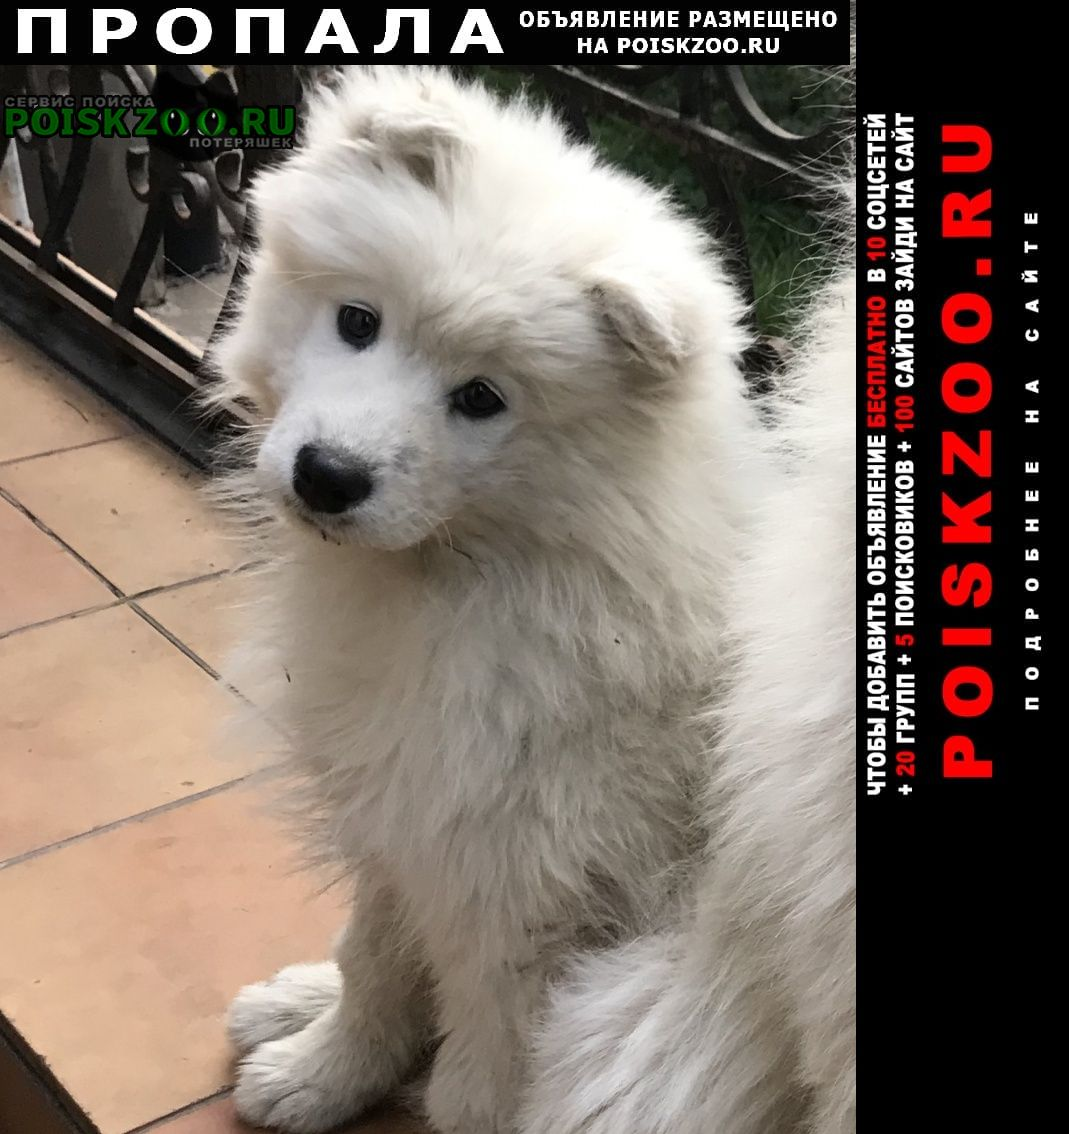 Пропала собака щенок самоеда Москва